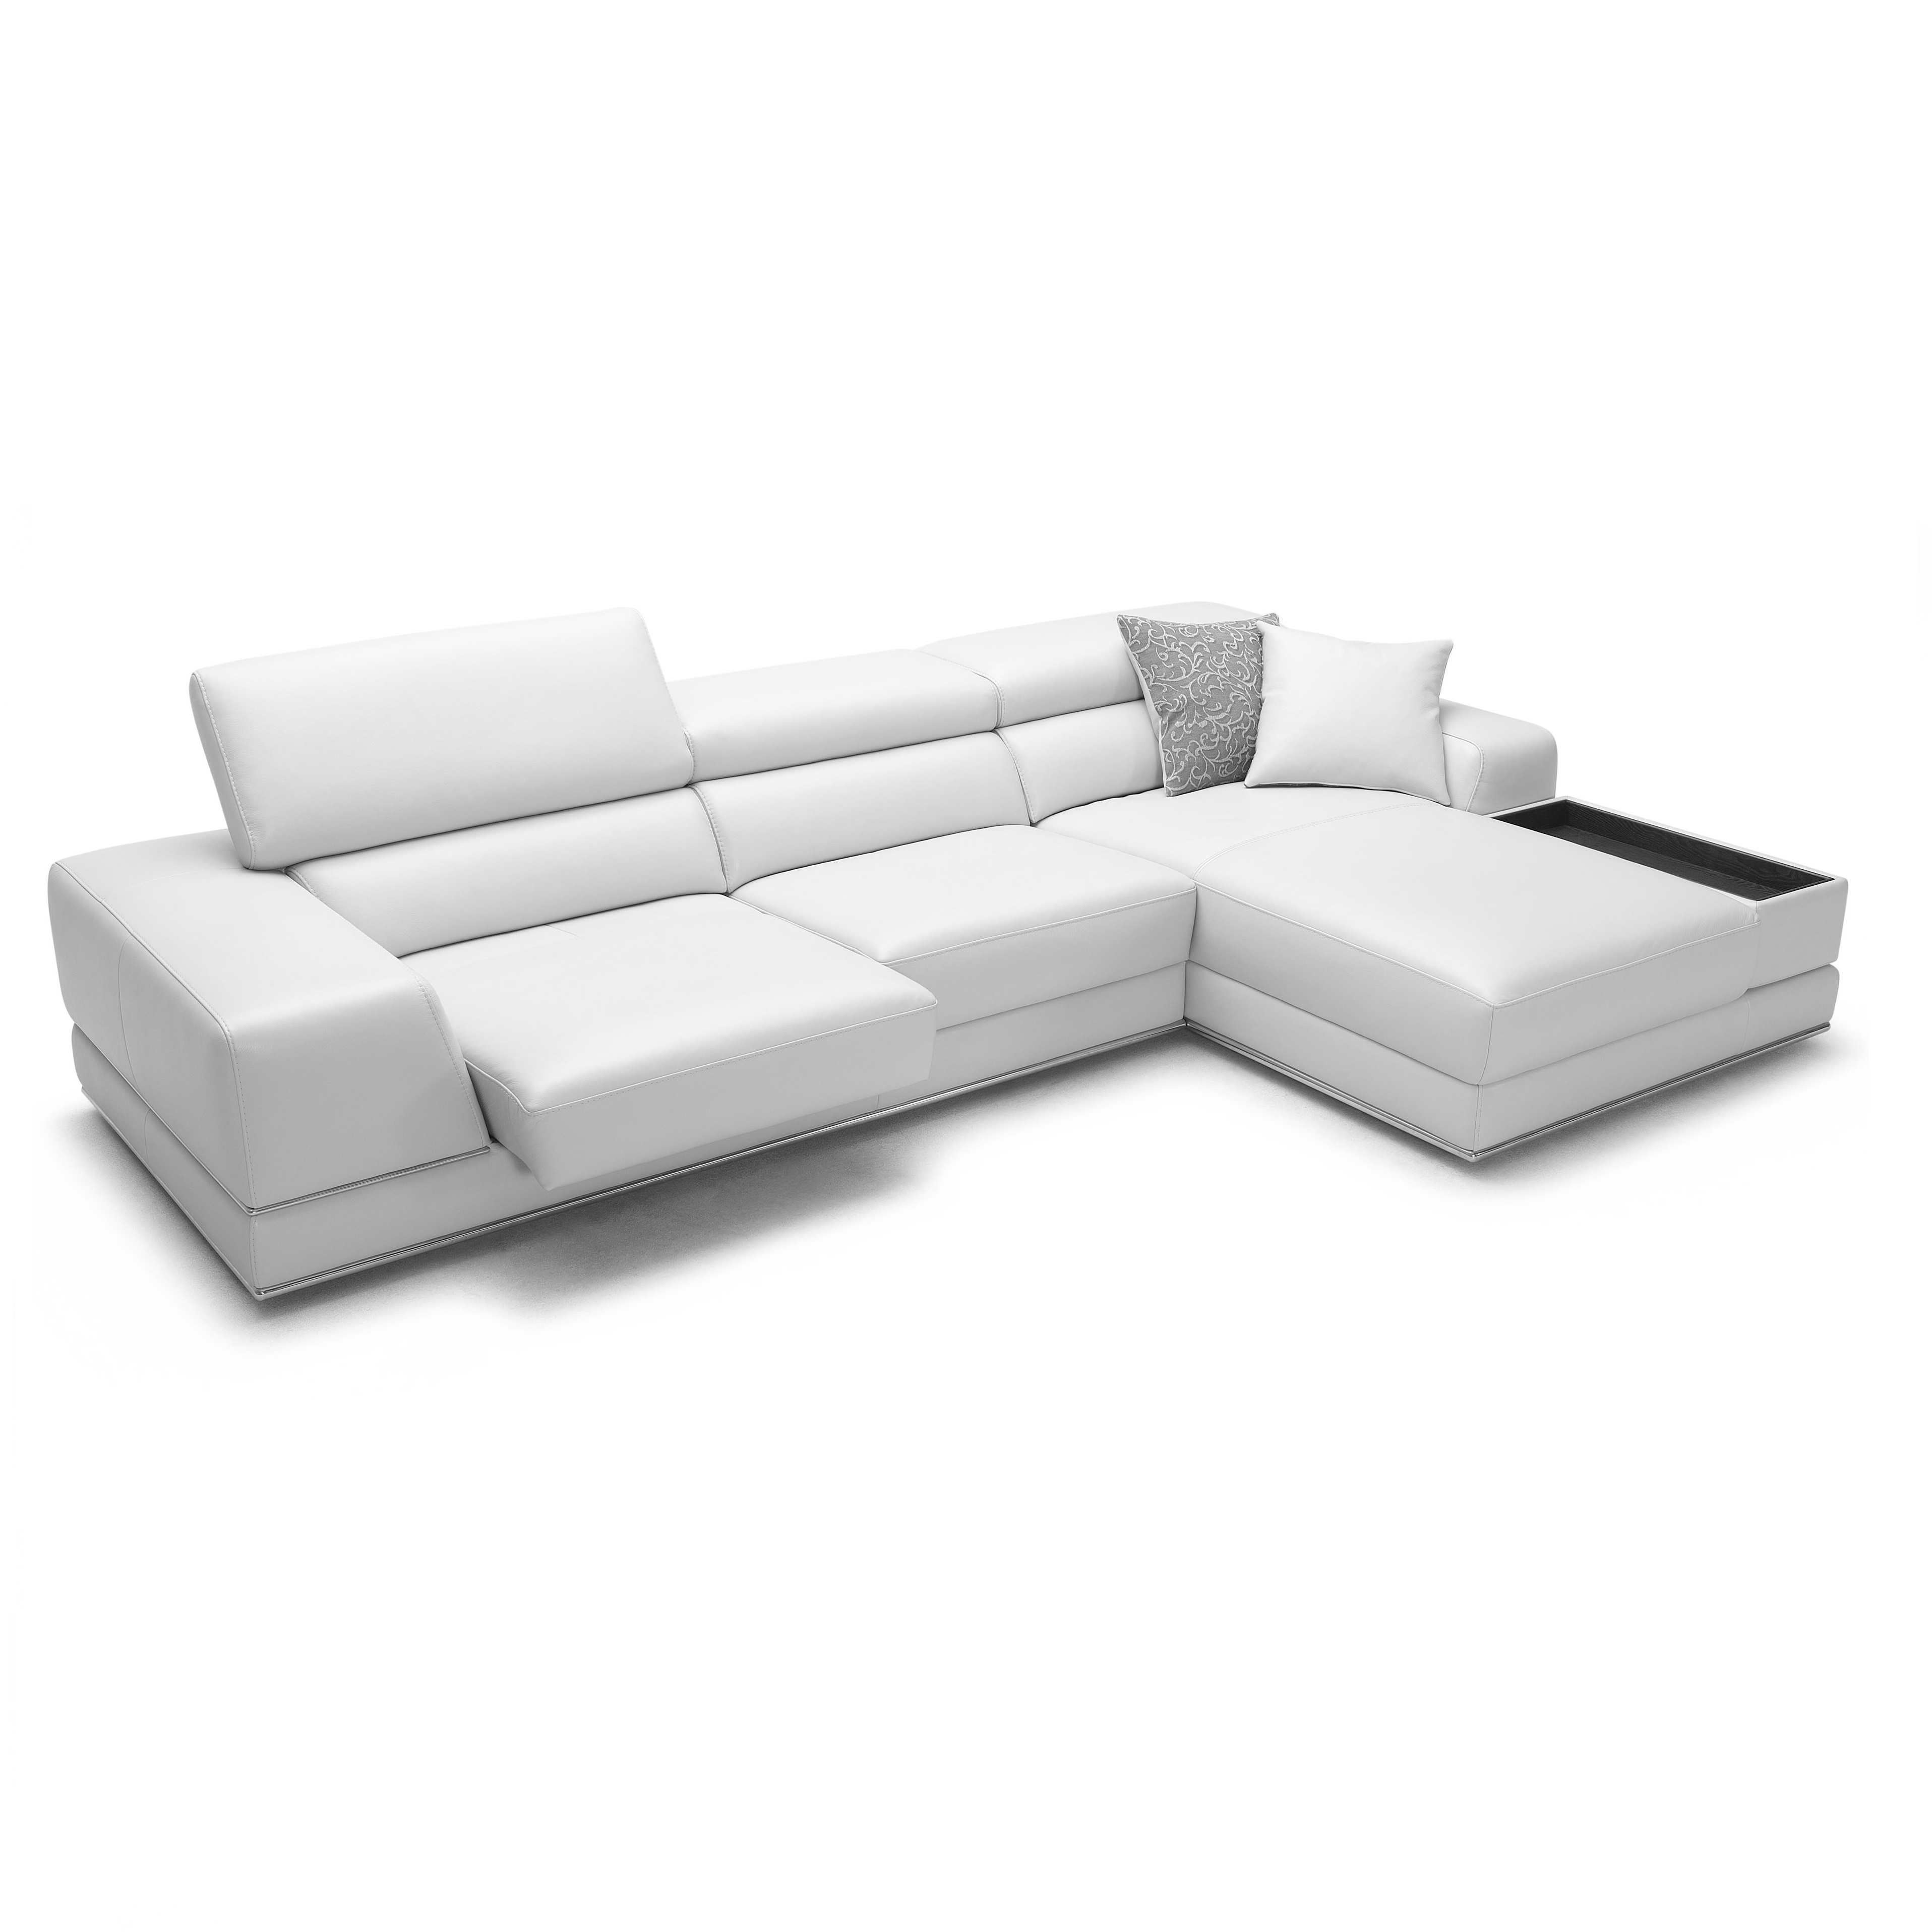 leather modern sectional sofa white brown premium reclining bergamo